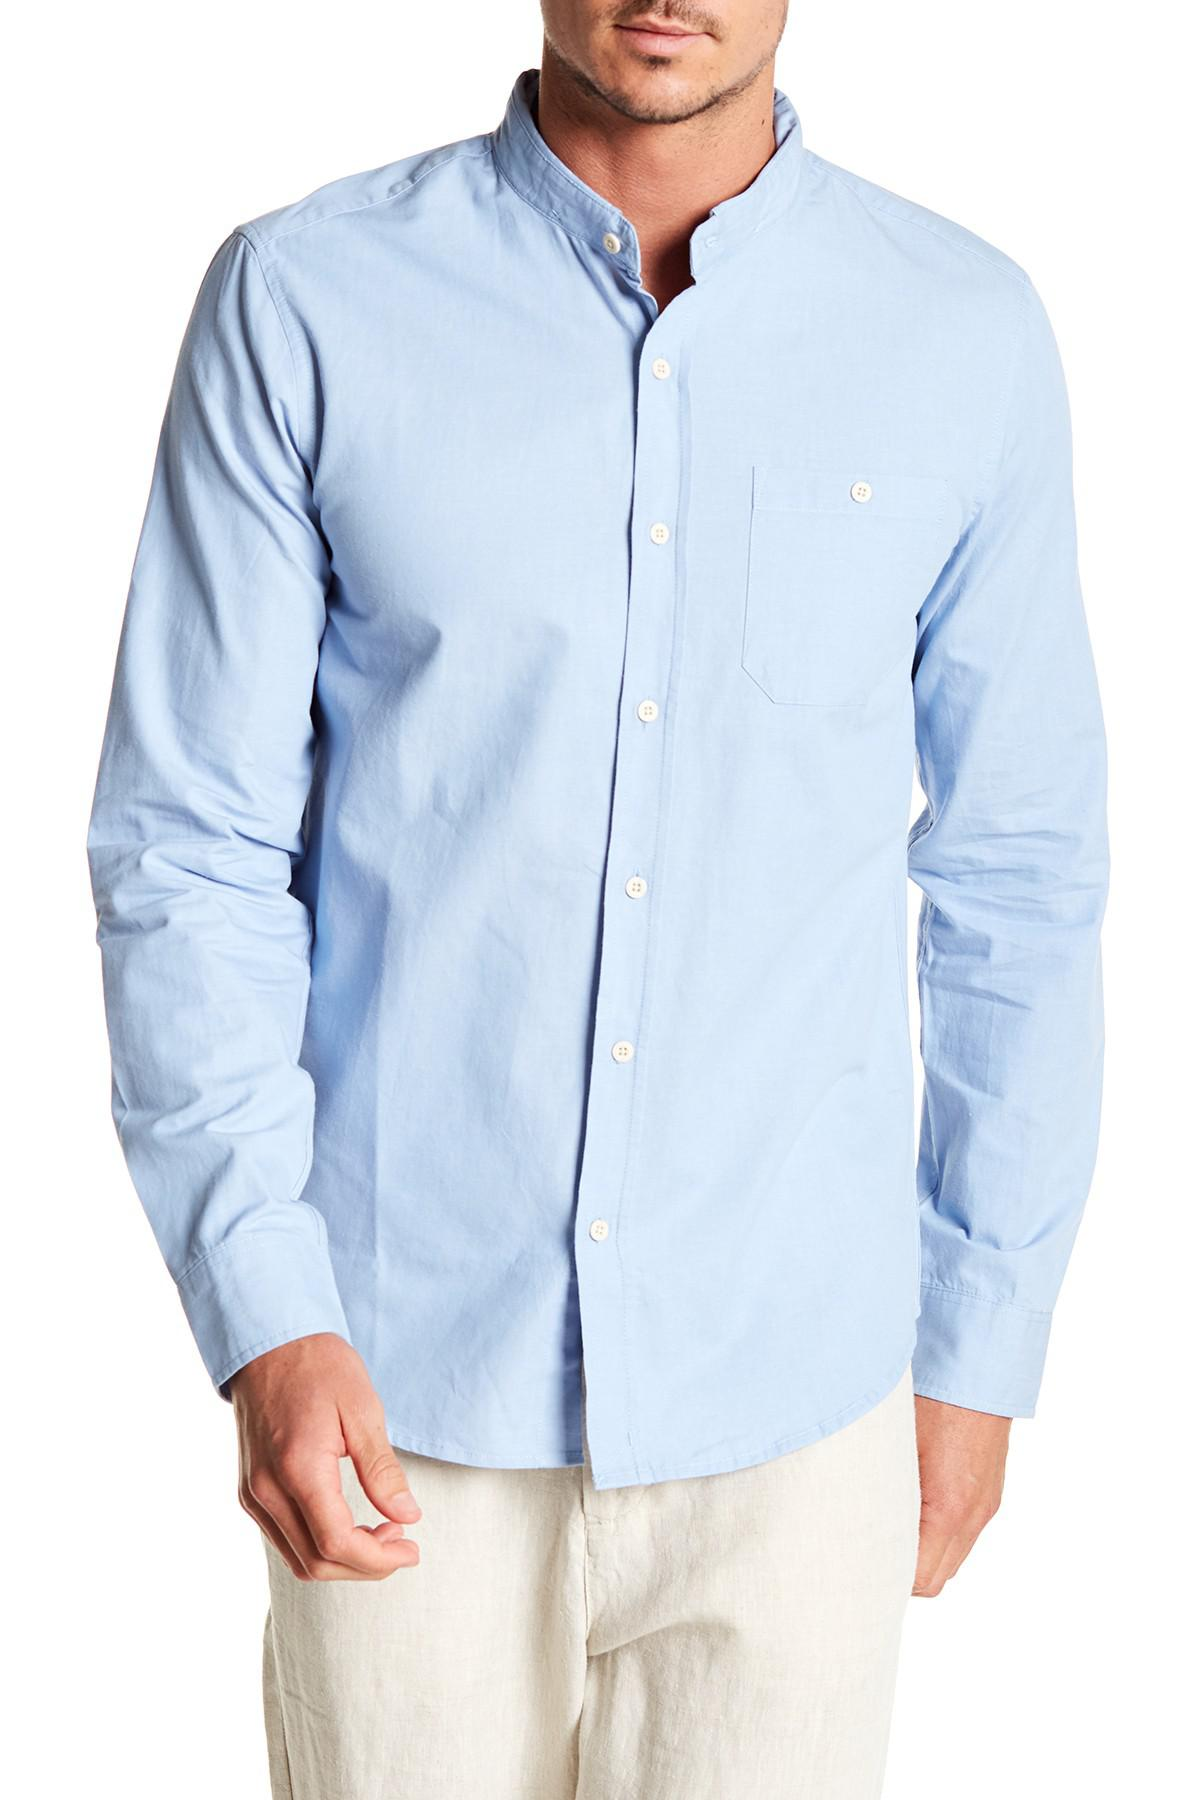 86a6f808b193d Lyst - Tavik Miner Reversible Collar Long Sleeve Modern Fit Shirt in ...